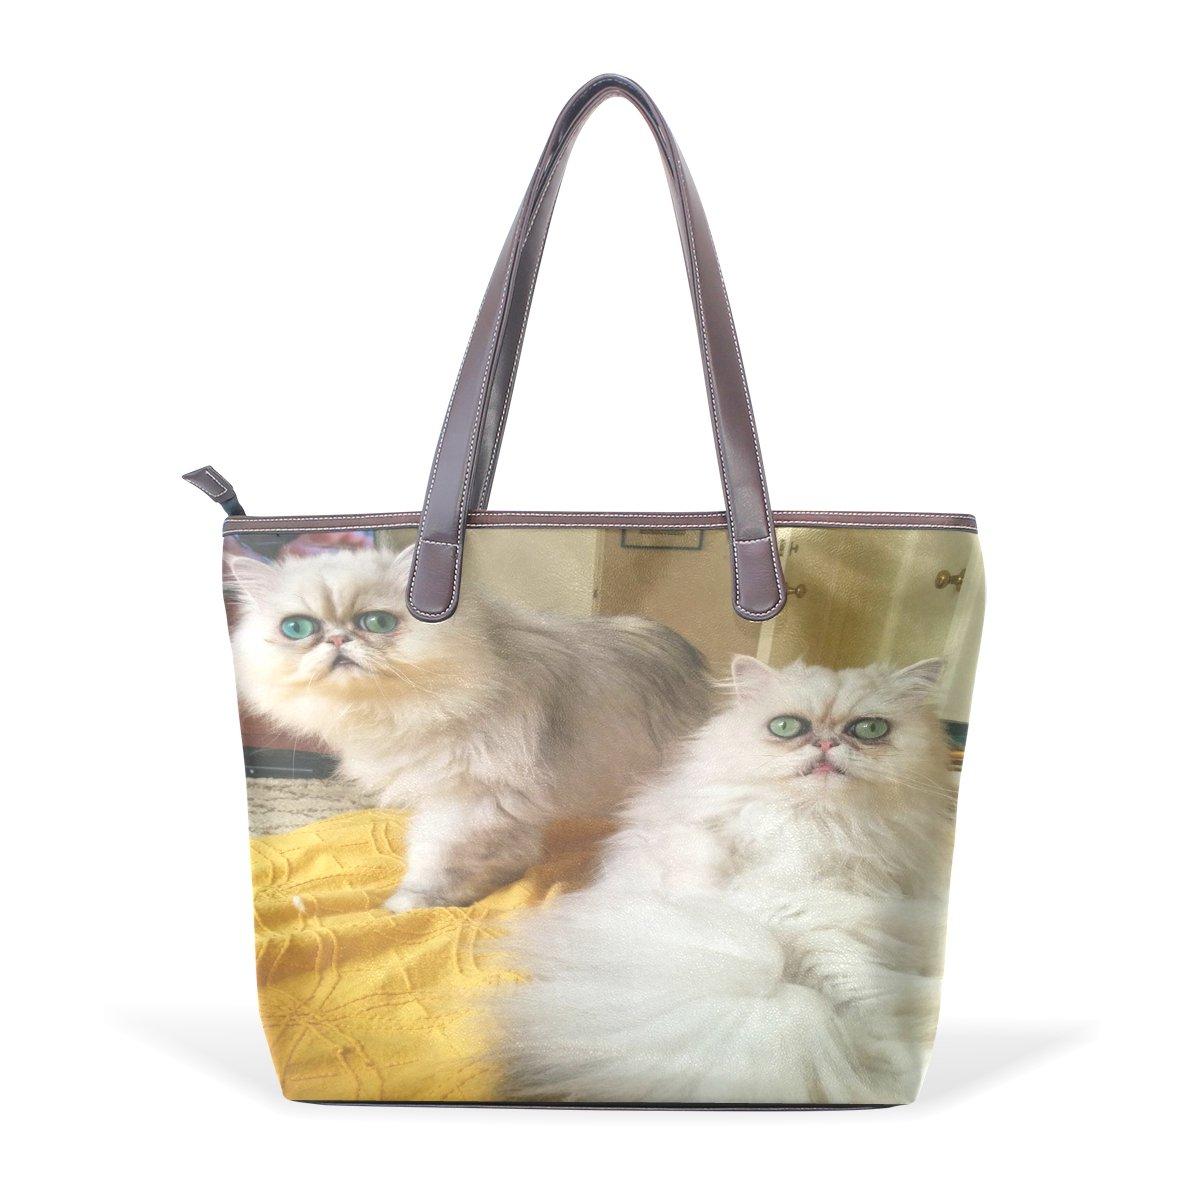 Ye Store Persian Cat Lady PU Leather Handbag Tote Bag Shoulder Bag Shopping Bag